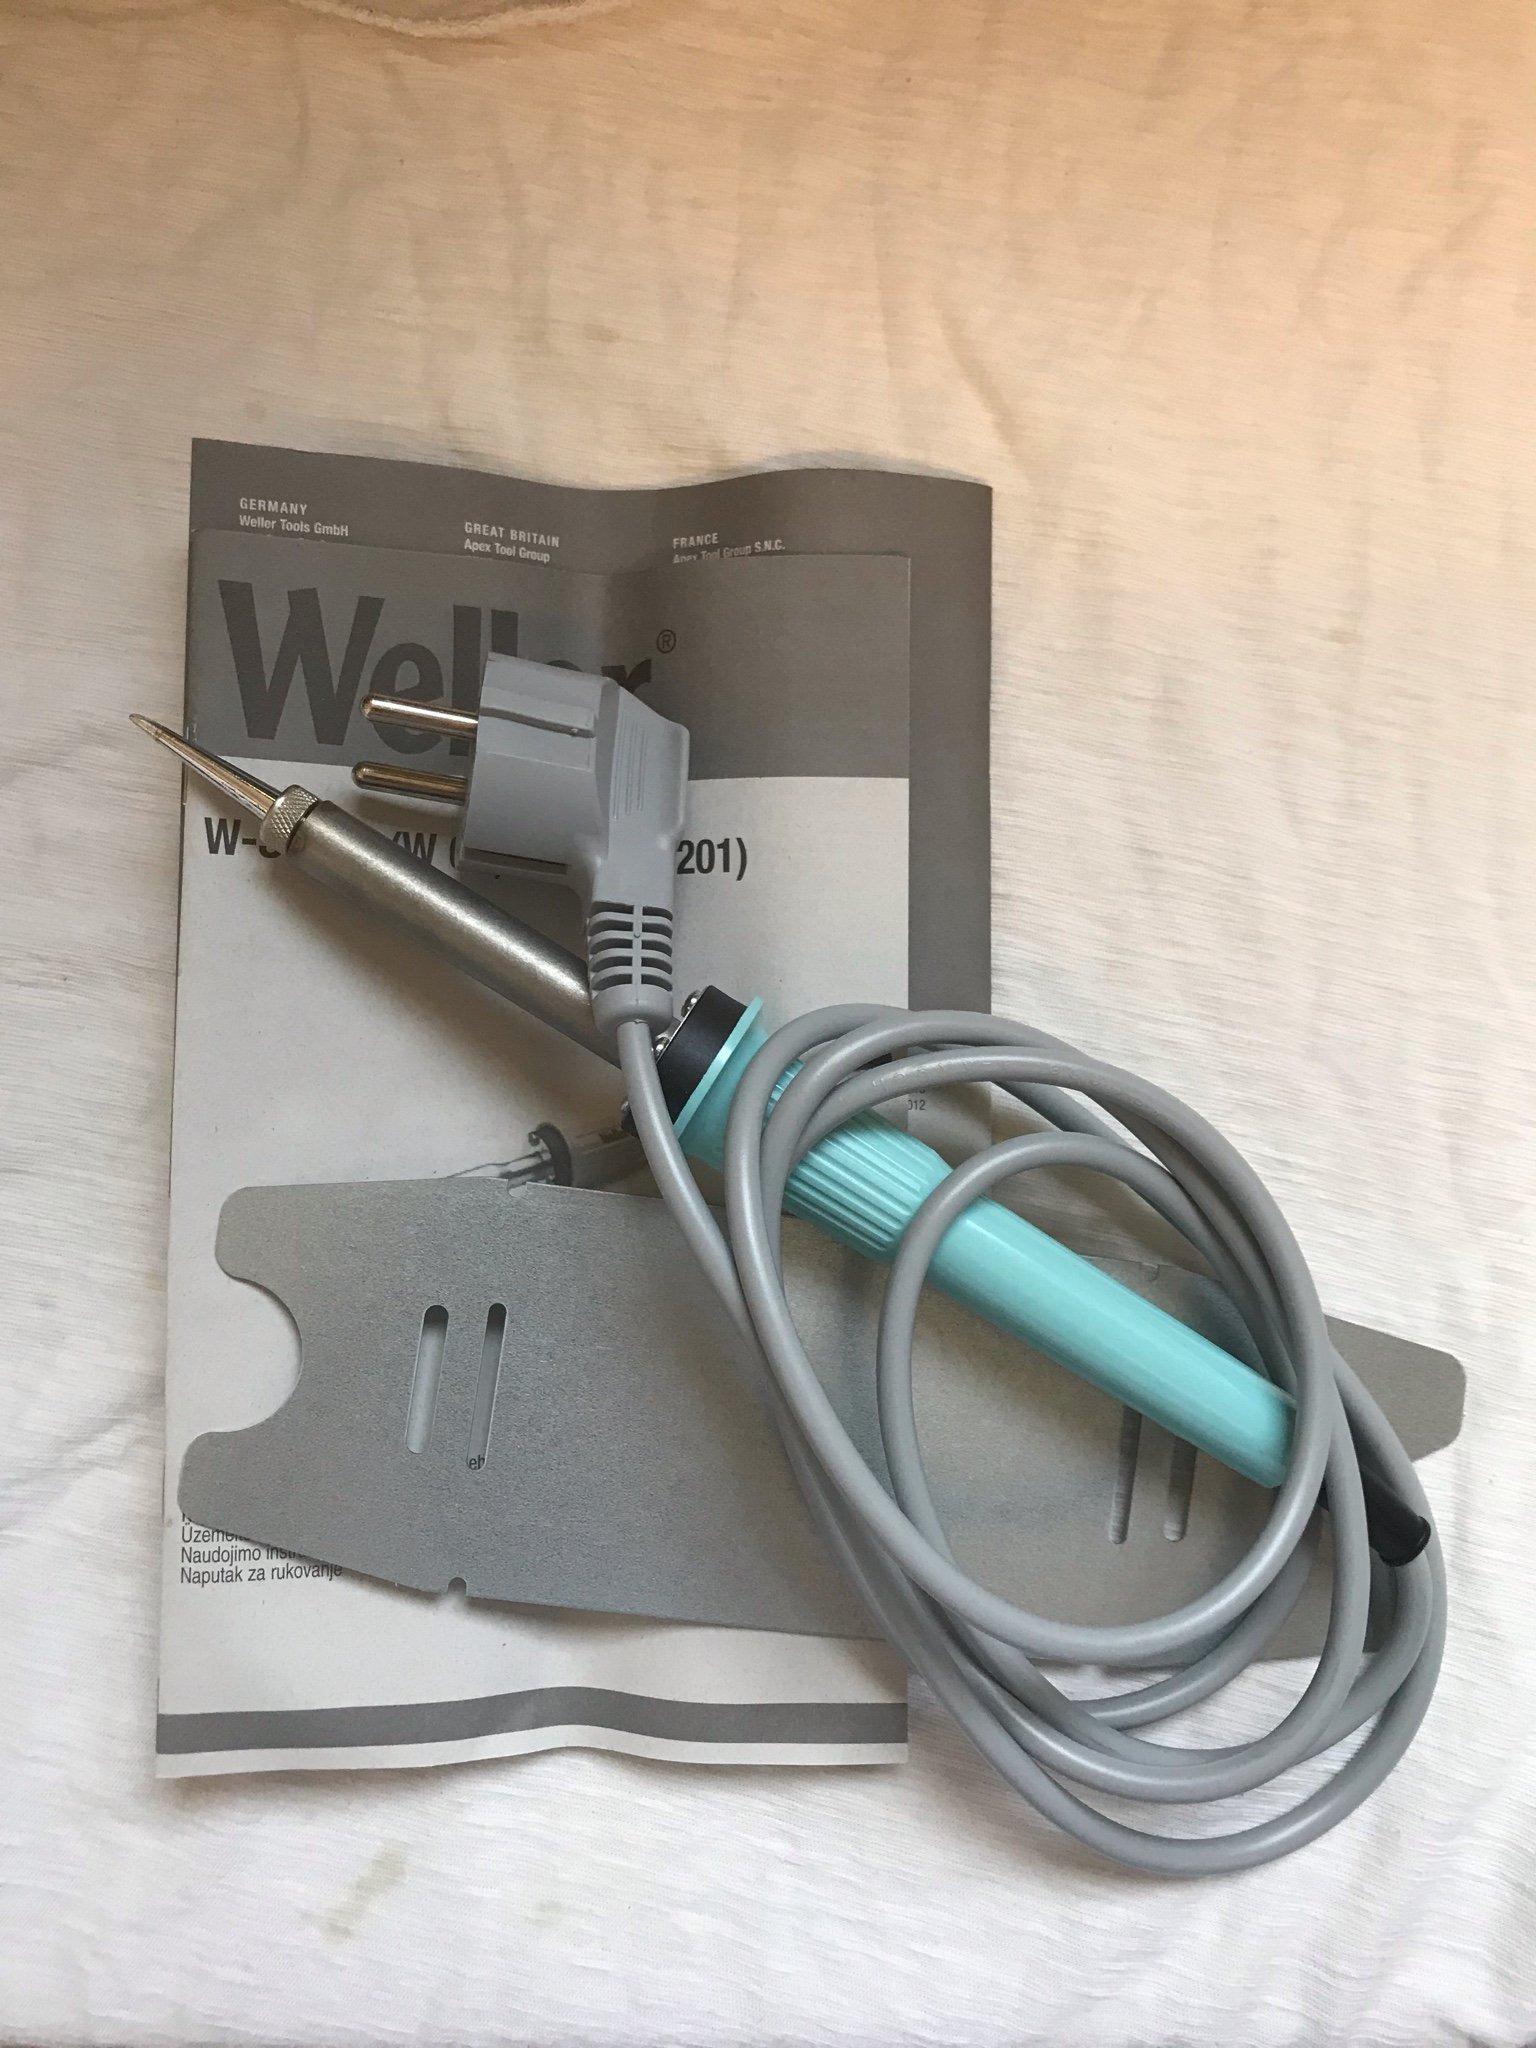 Strålande Lödkolv Weller W 61 Electric Soldering Iron, 60W (360260439) ᐈ XO-67